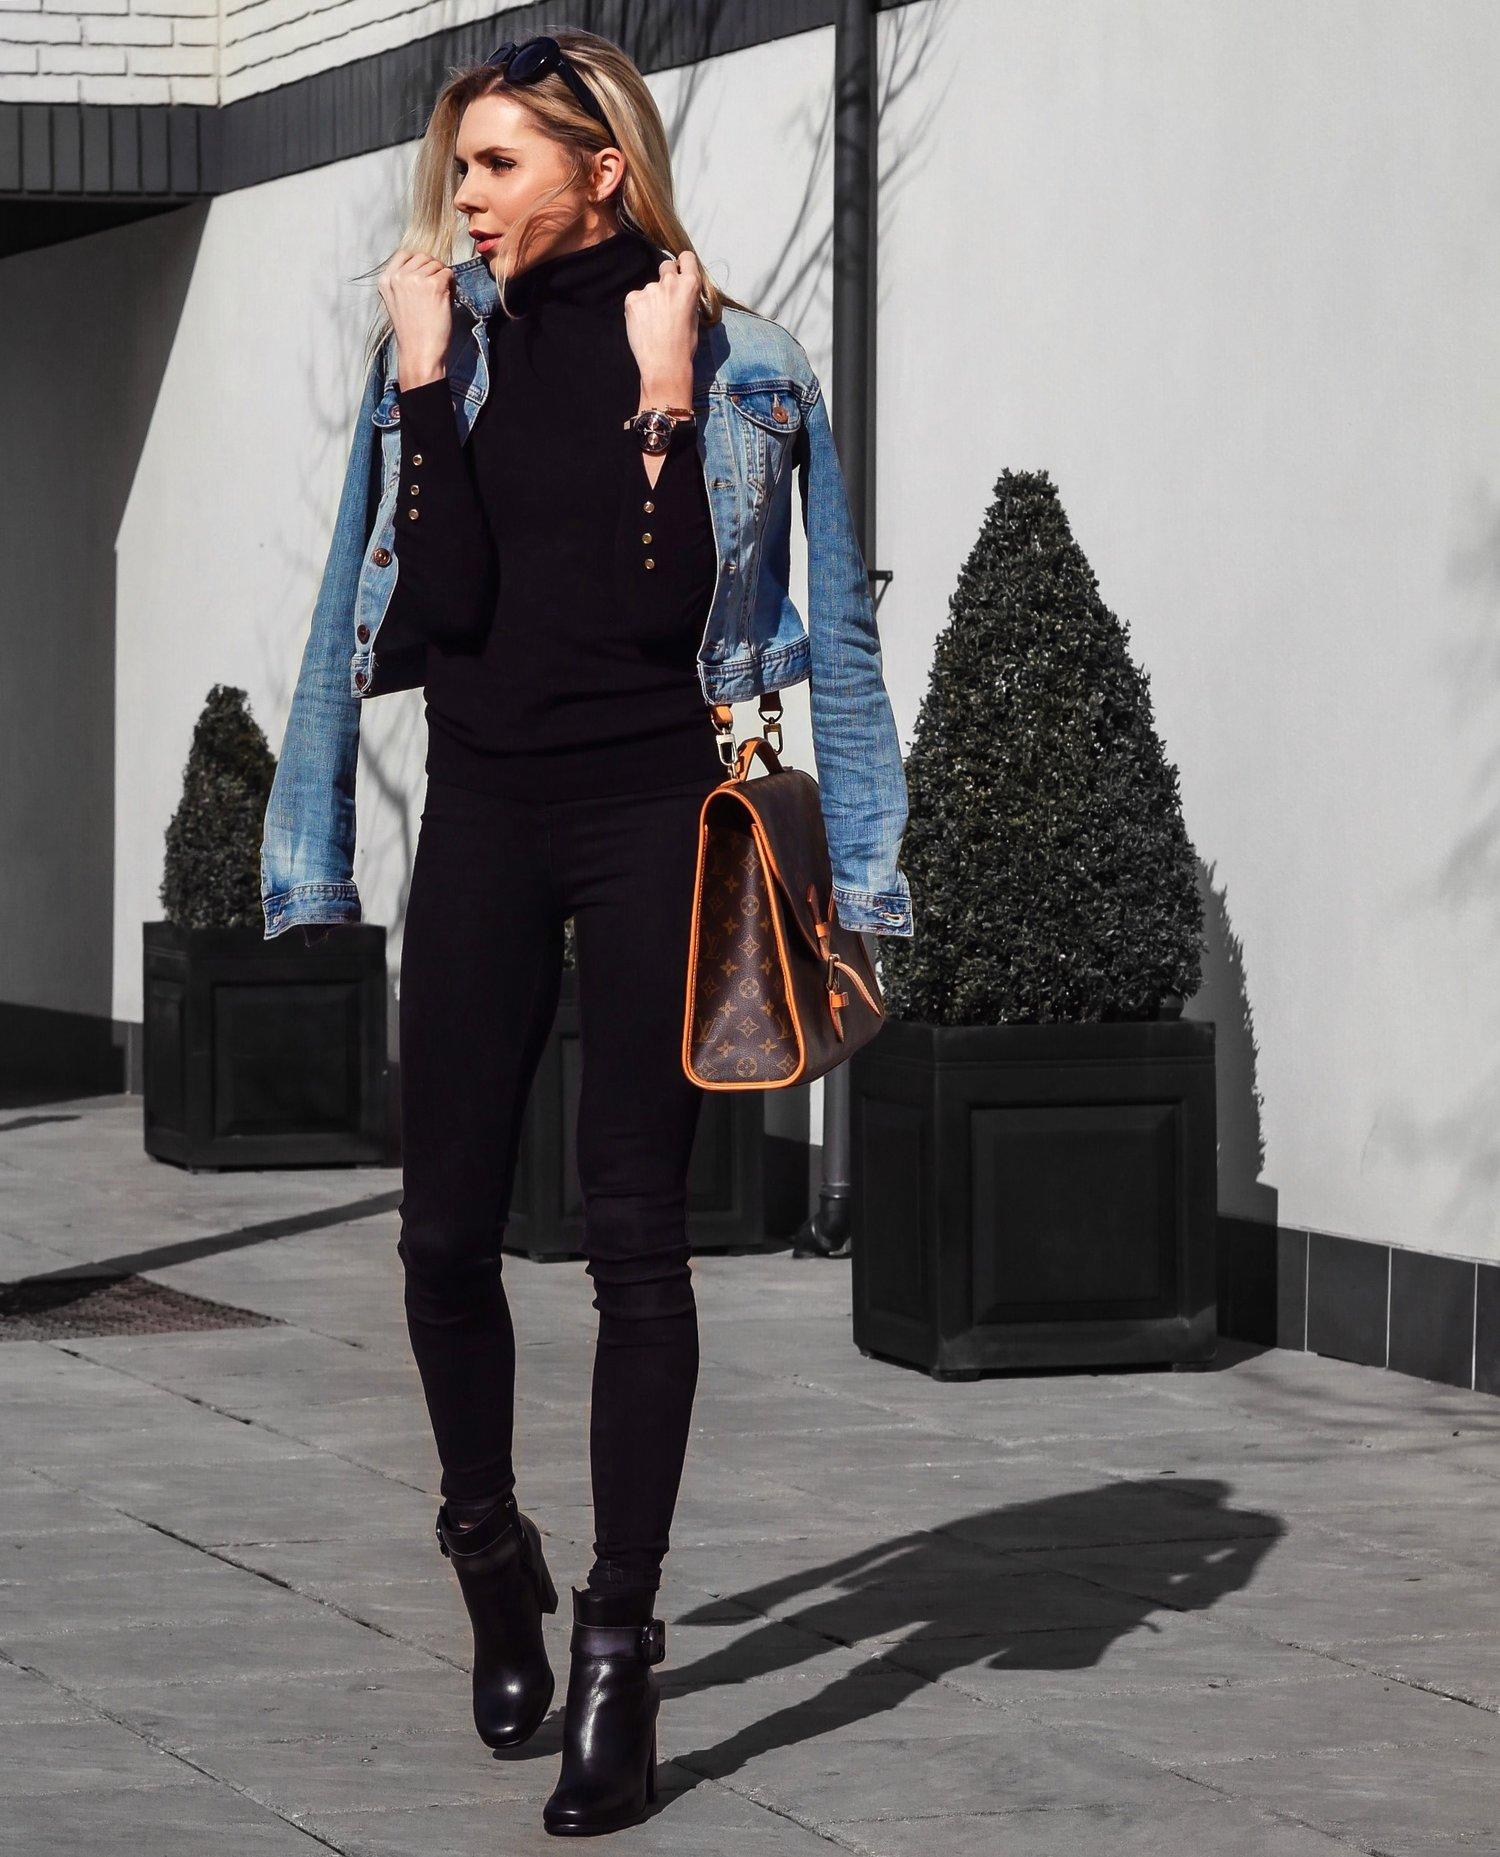 haul, affordable fashion, streetstyle, inspiration, what to wear, fashion, lookbook, style, fashion blogger, laura blair, youtuber, london fashion girl, louis vuitton, uncloset uk